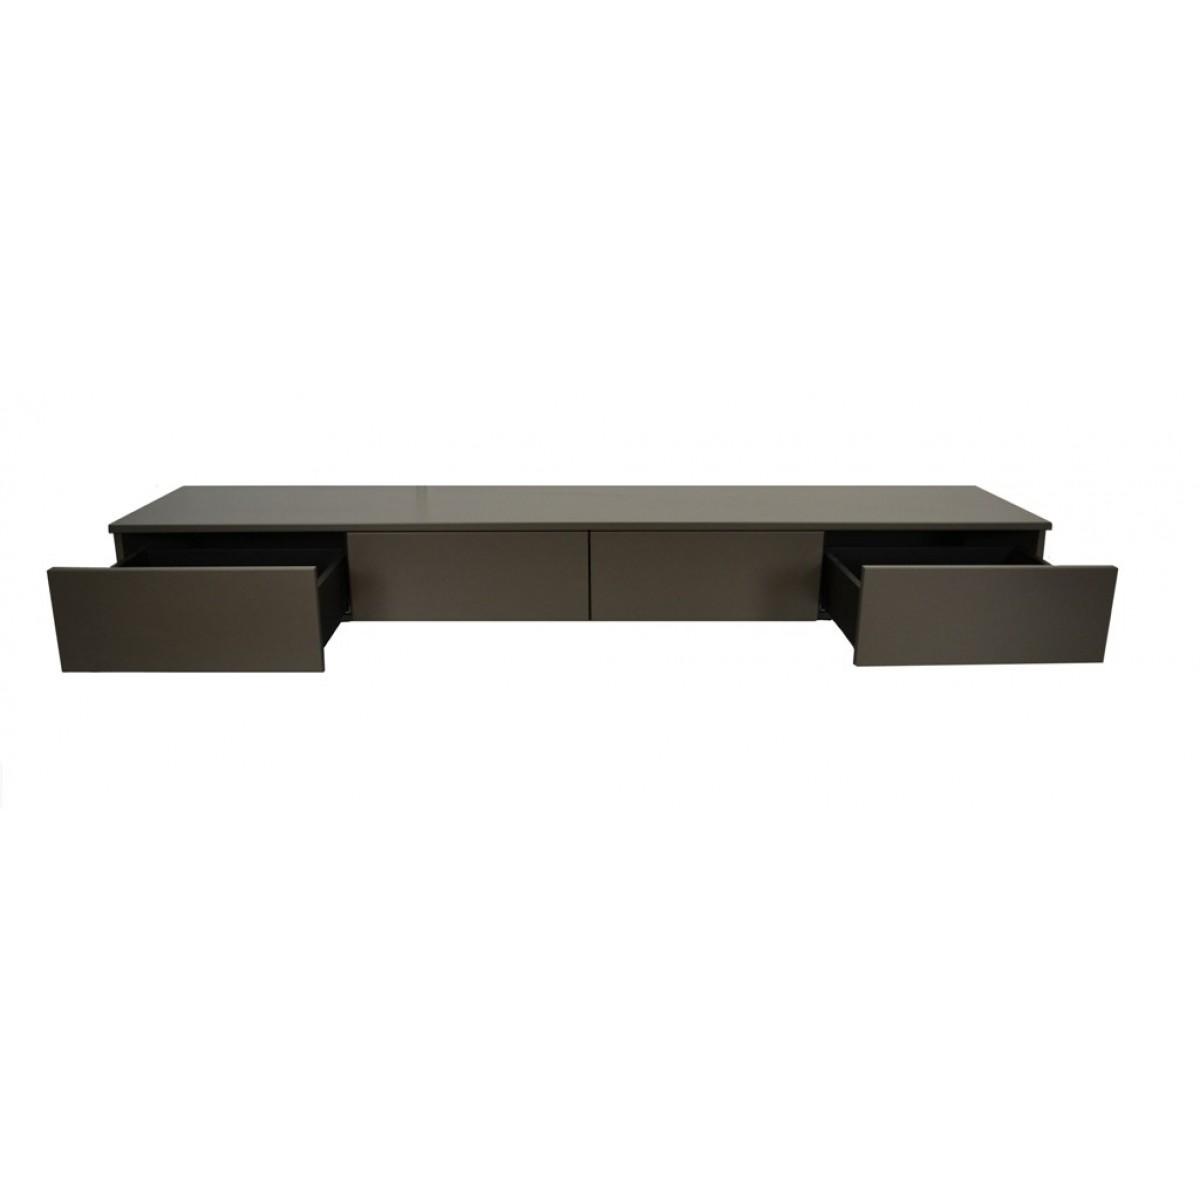 hangend-hang-tv-dressoir-meubel-kleur-basalt-laden-open